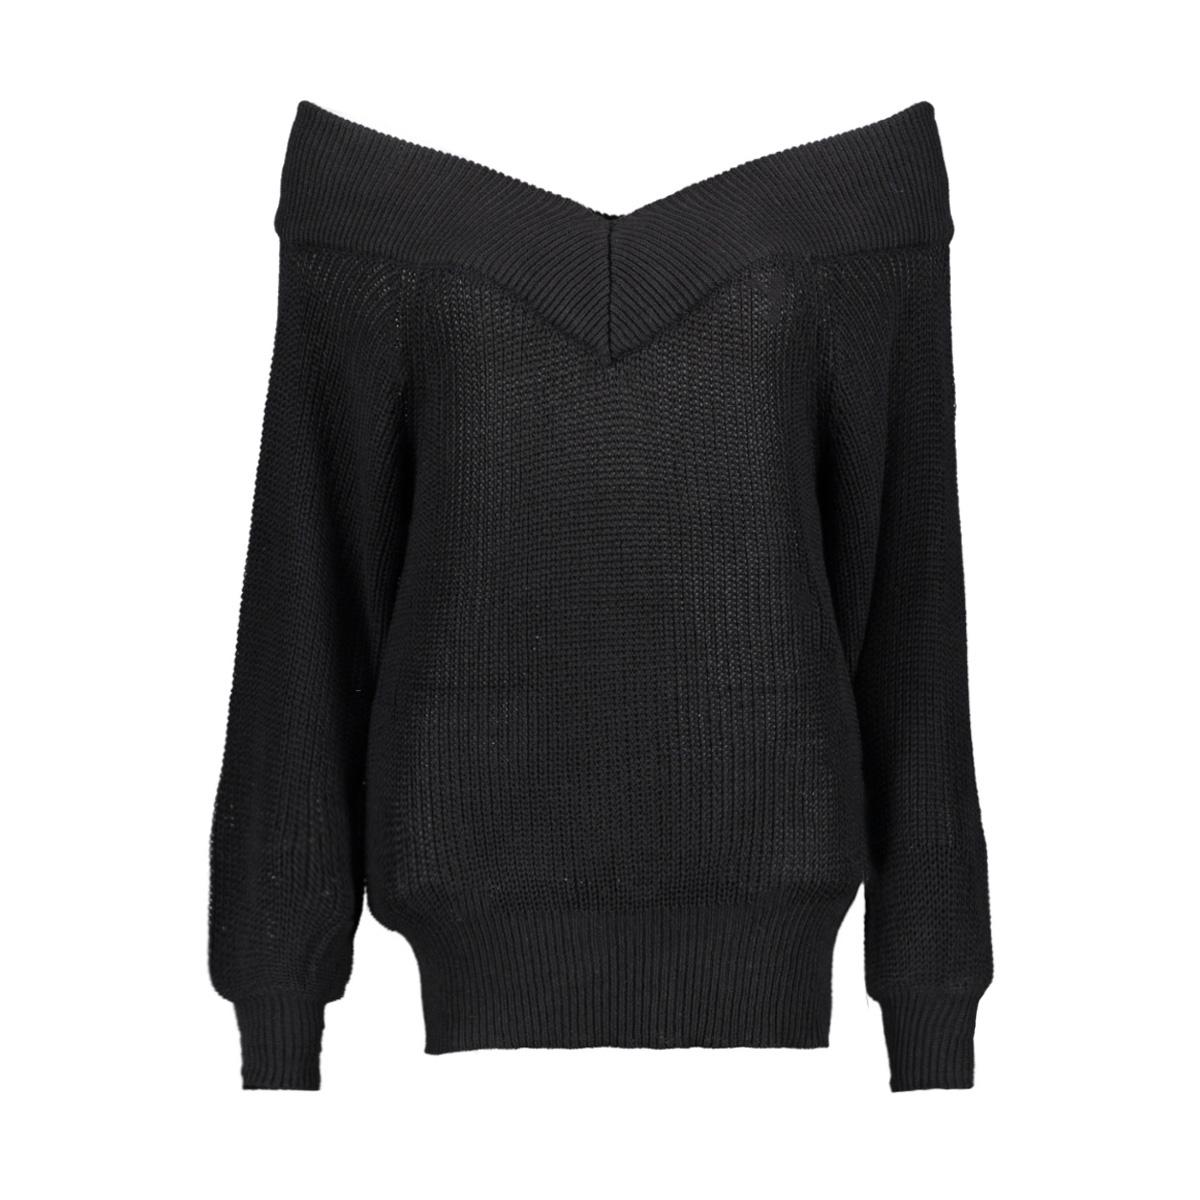 objlandaz l/s knit pullover 105 23031384 object trui black